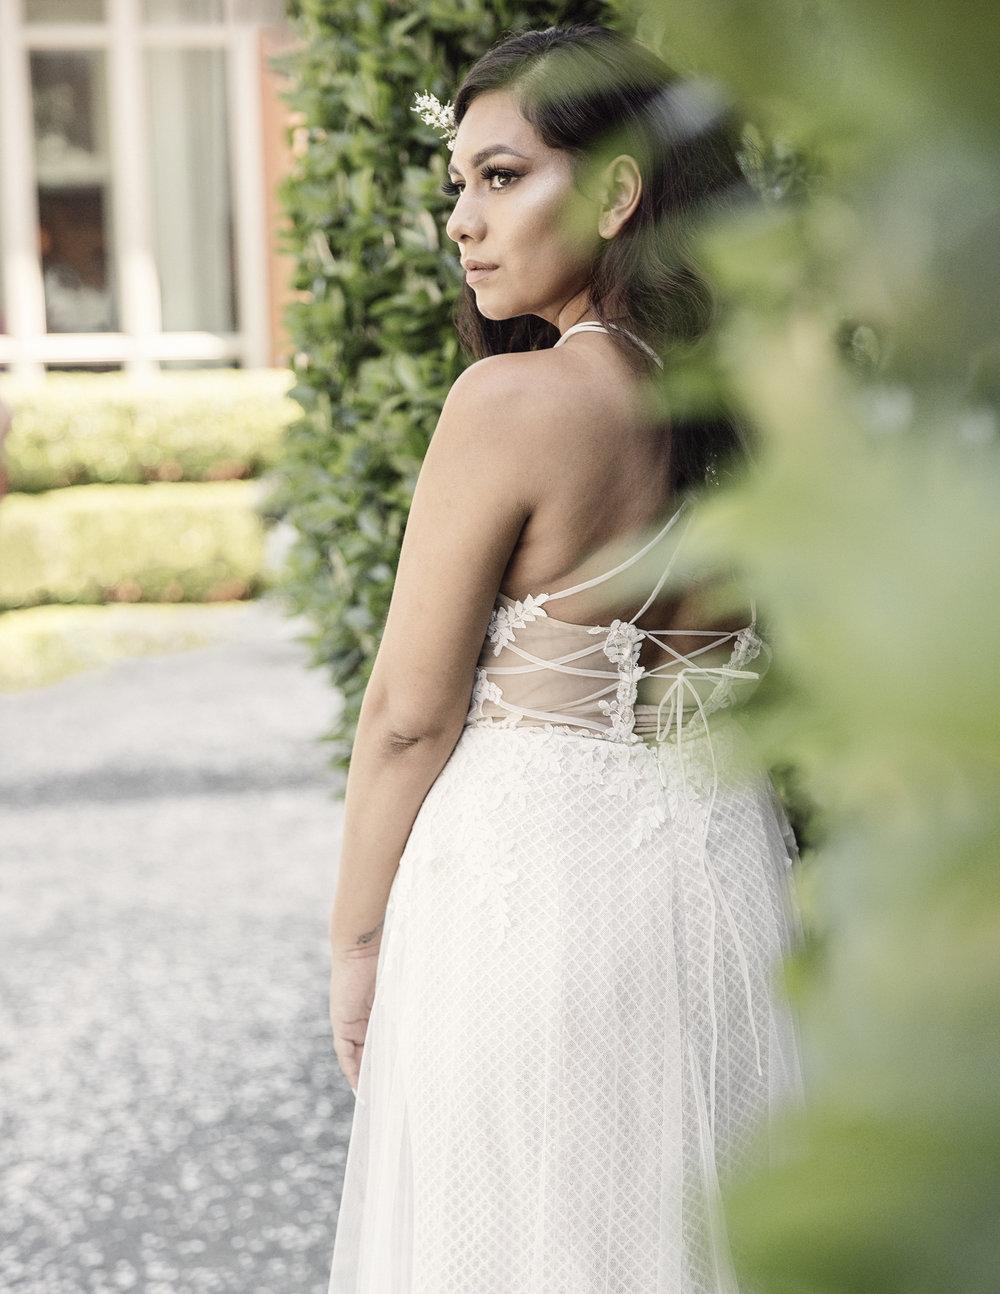 savannah-bridal-shop-unexpected-joys-of-wedding-planning-savannah-wedding-planning-gina-vogel-photography-savannah-weddings-15.jpg